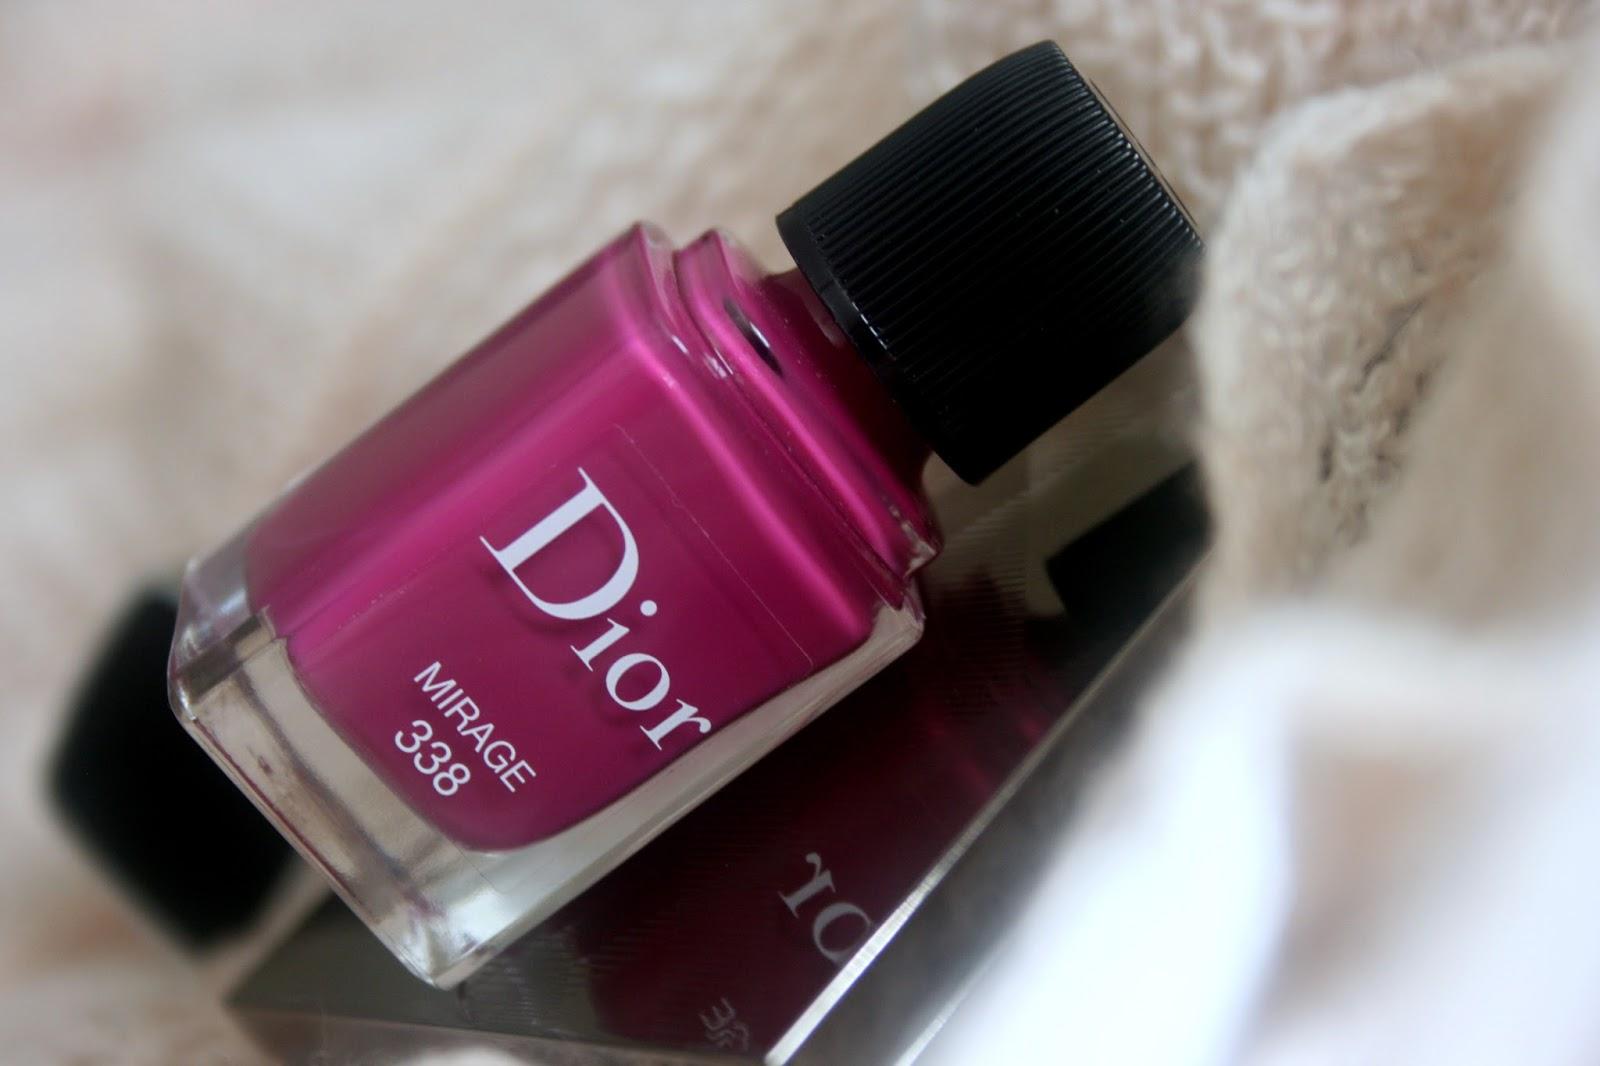 Dior Vernis Mirage #338